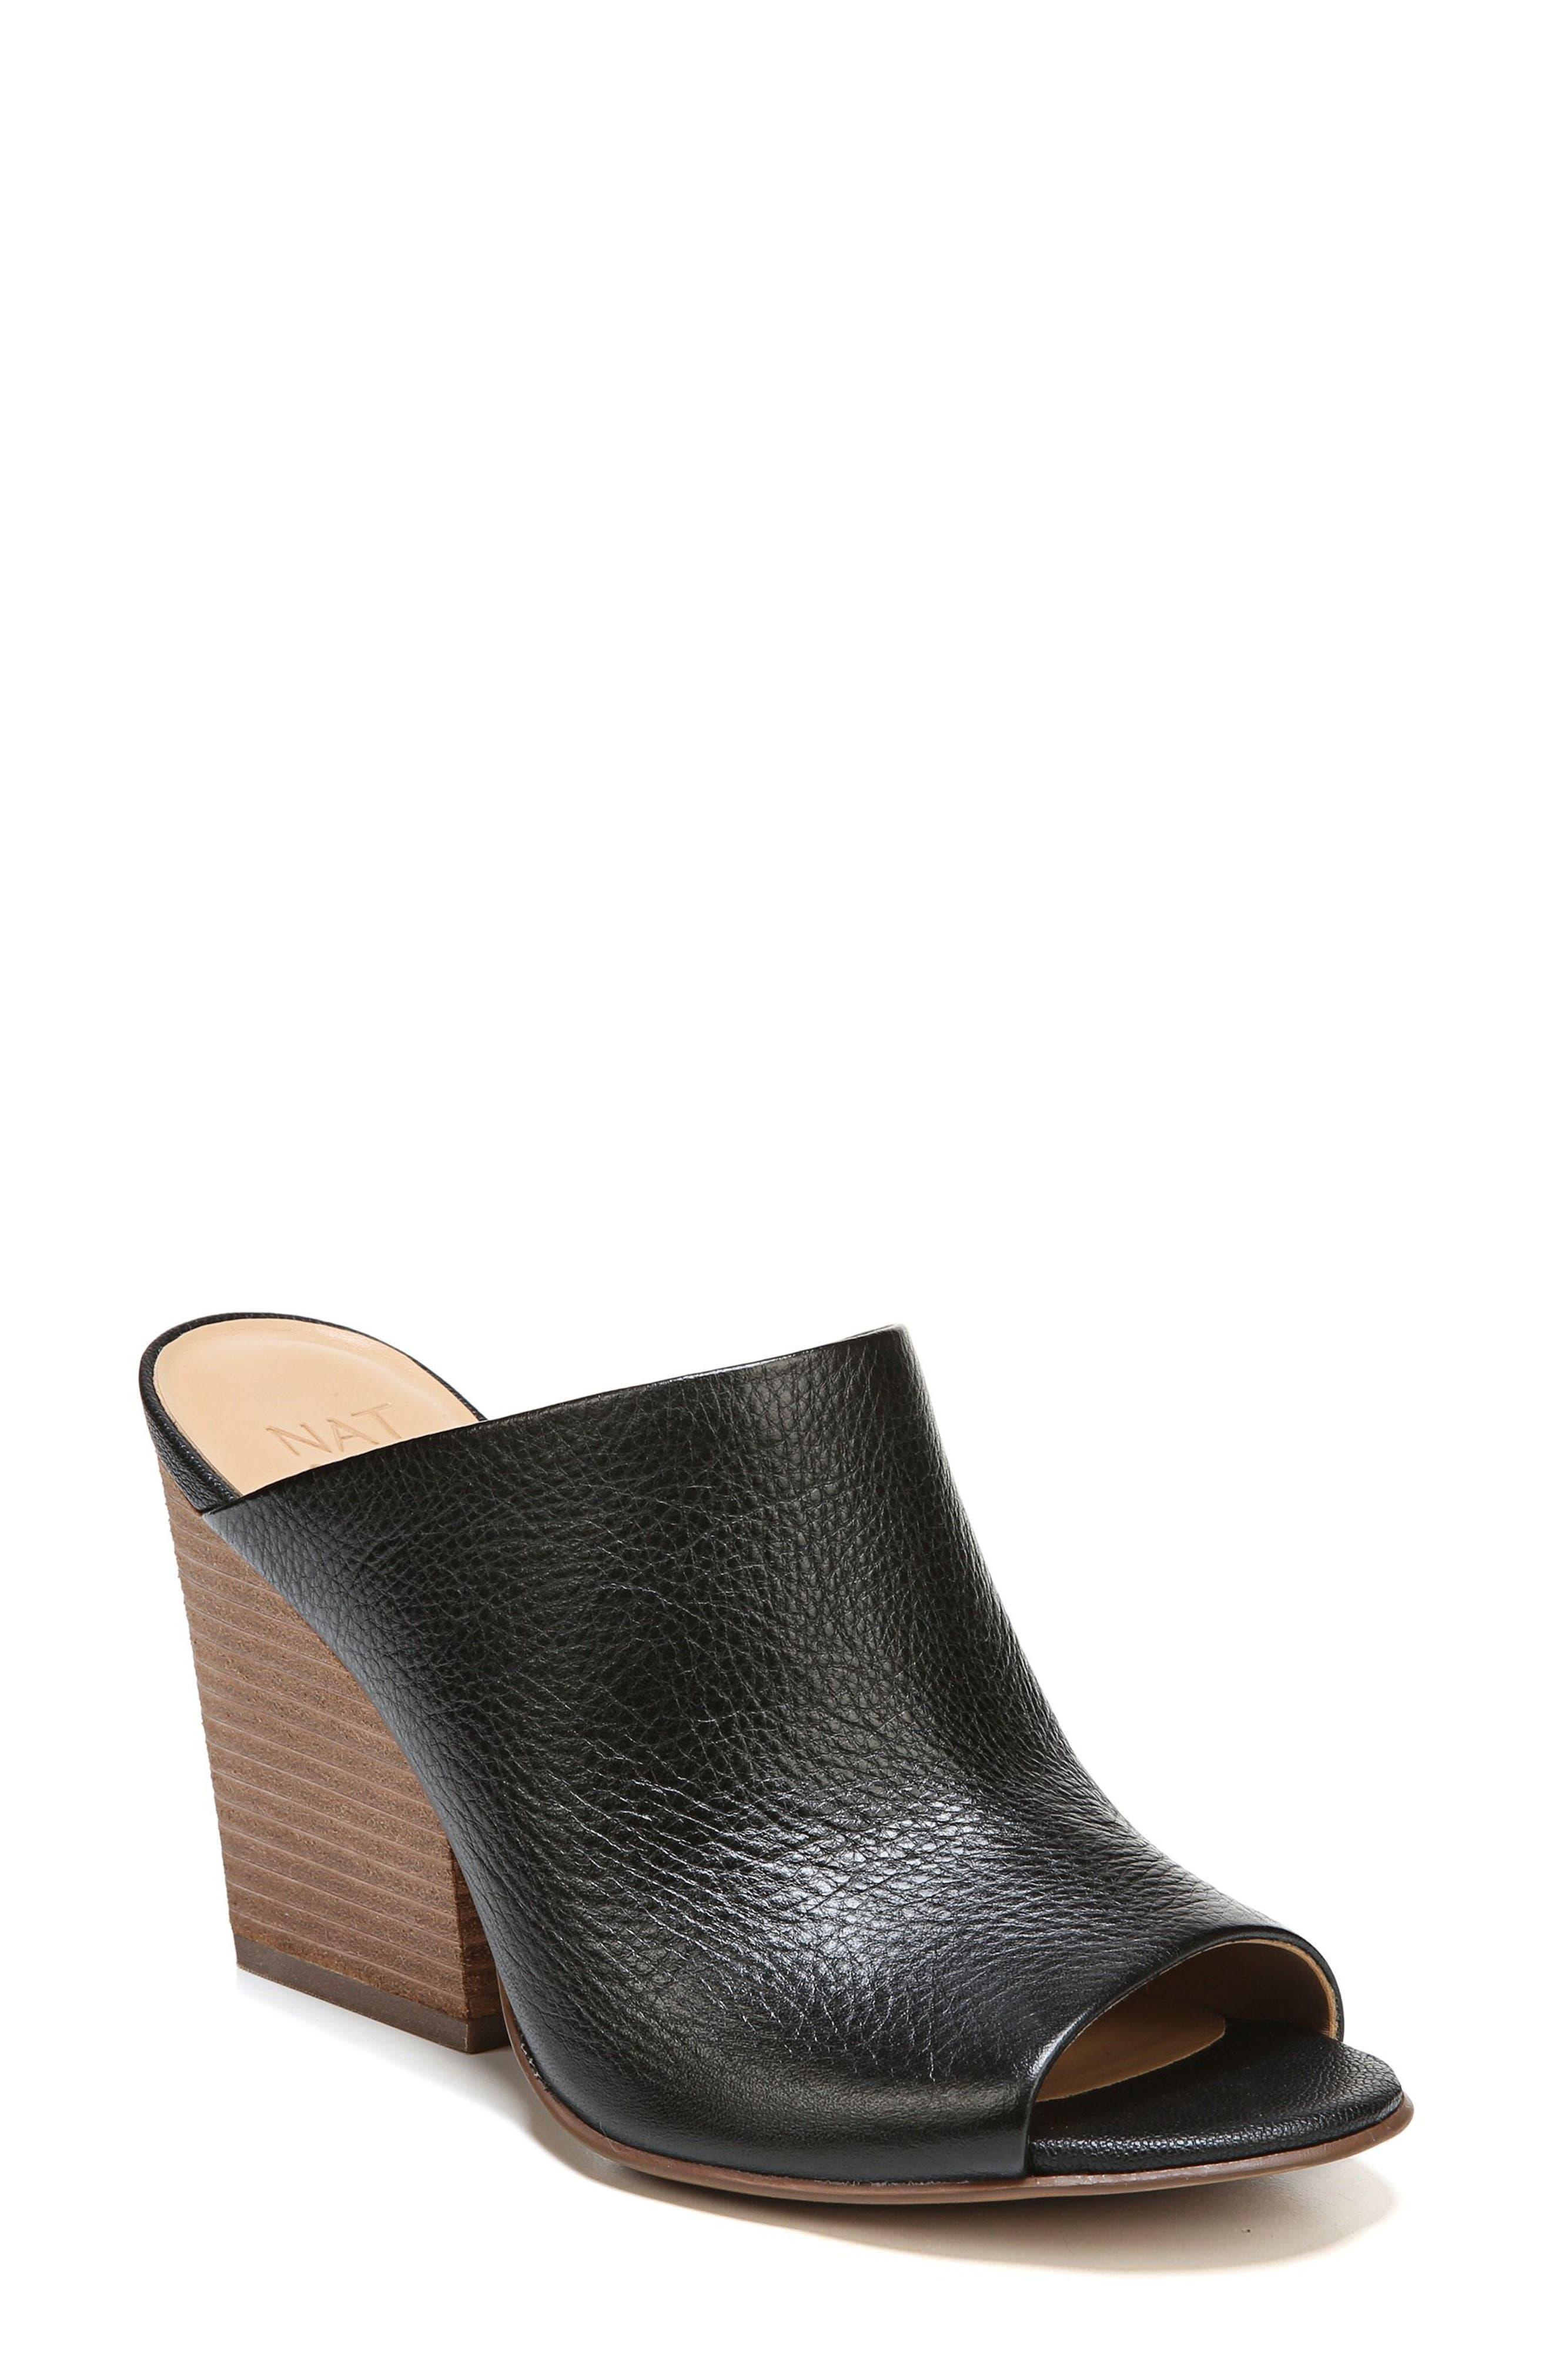 Sloan Sandal,                         Main,                         color, Black Pebbled Leather